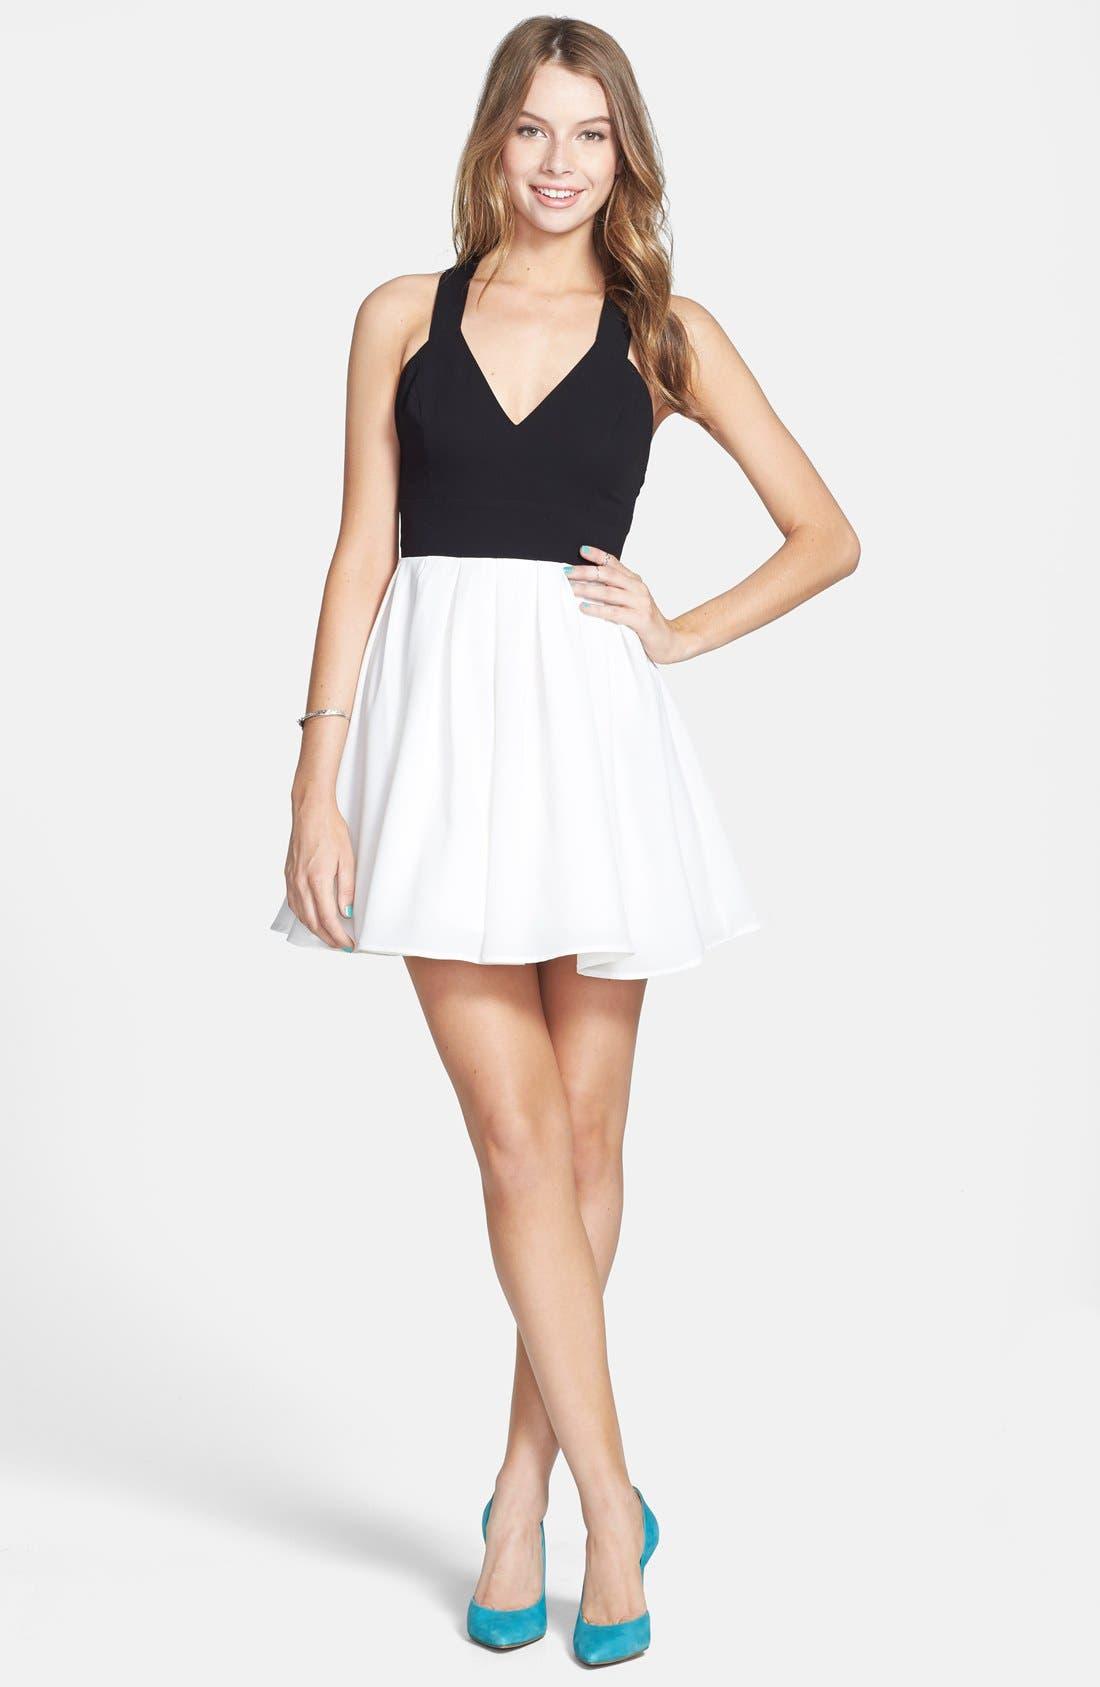 Alternate Image 1 Selected - En Crème Colorblock Bow Back Dress (Juniors)